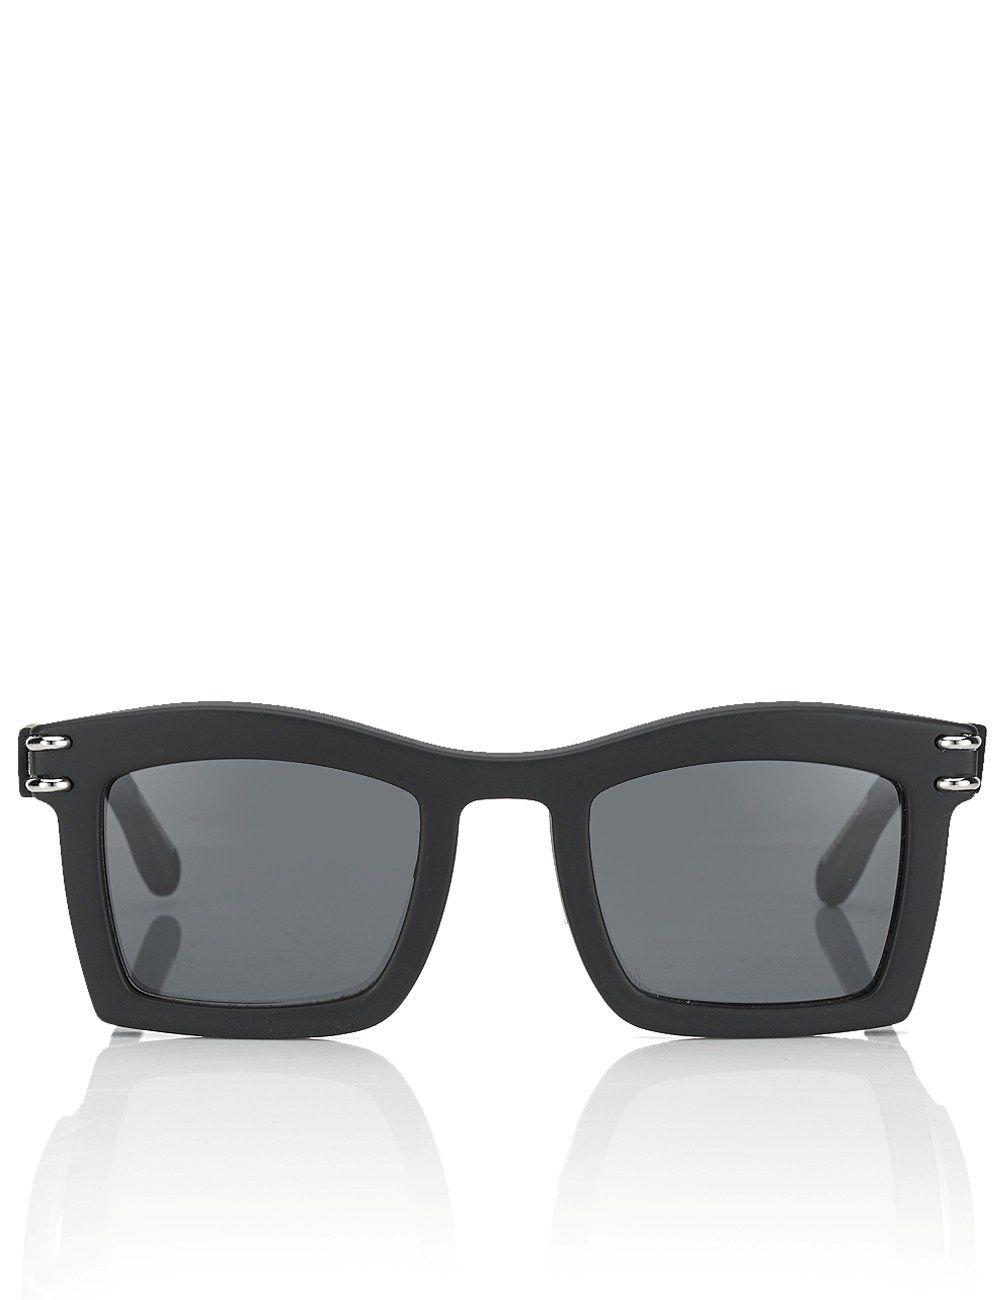 Buy Cheap Store Sale 100% Original EYEWEAR - Sunglasses Roland Mouret Online For Sale Sale In China For Sale Finishline WFOCxFrV